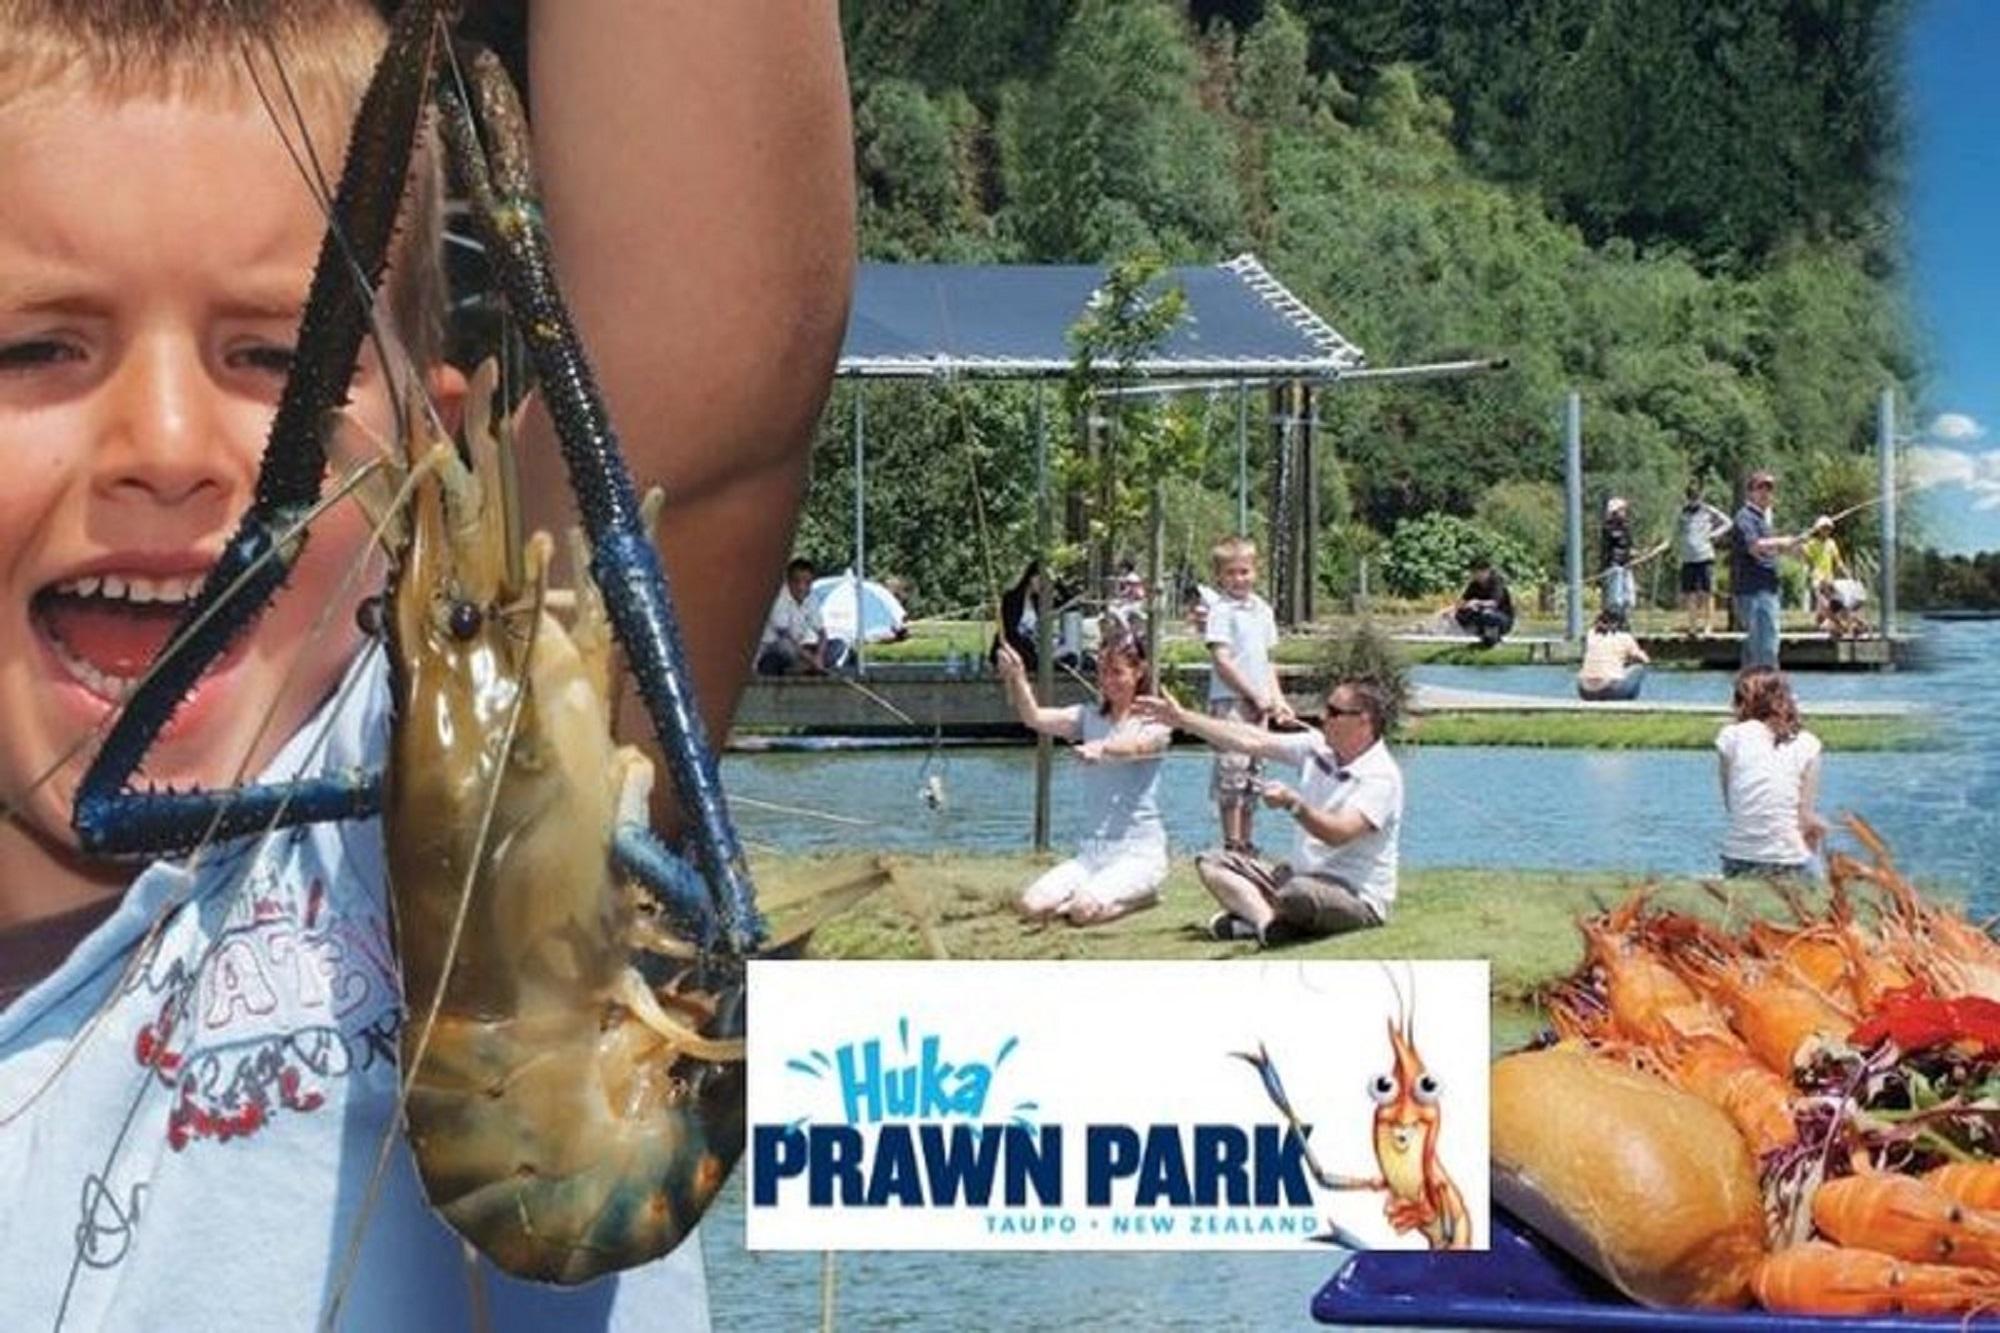 Huka Prawn Park-Lunch/Activities Combo